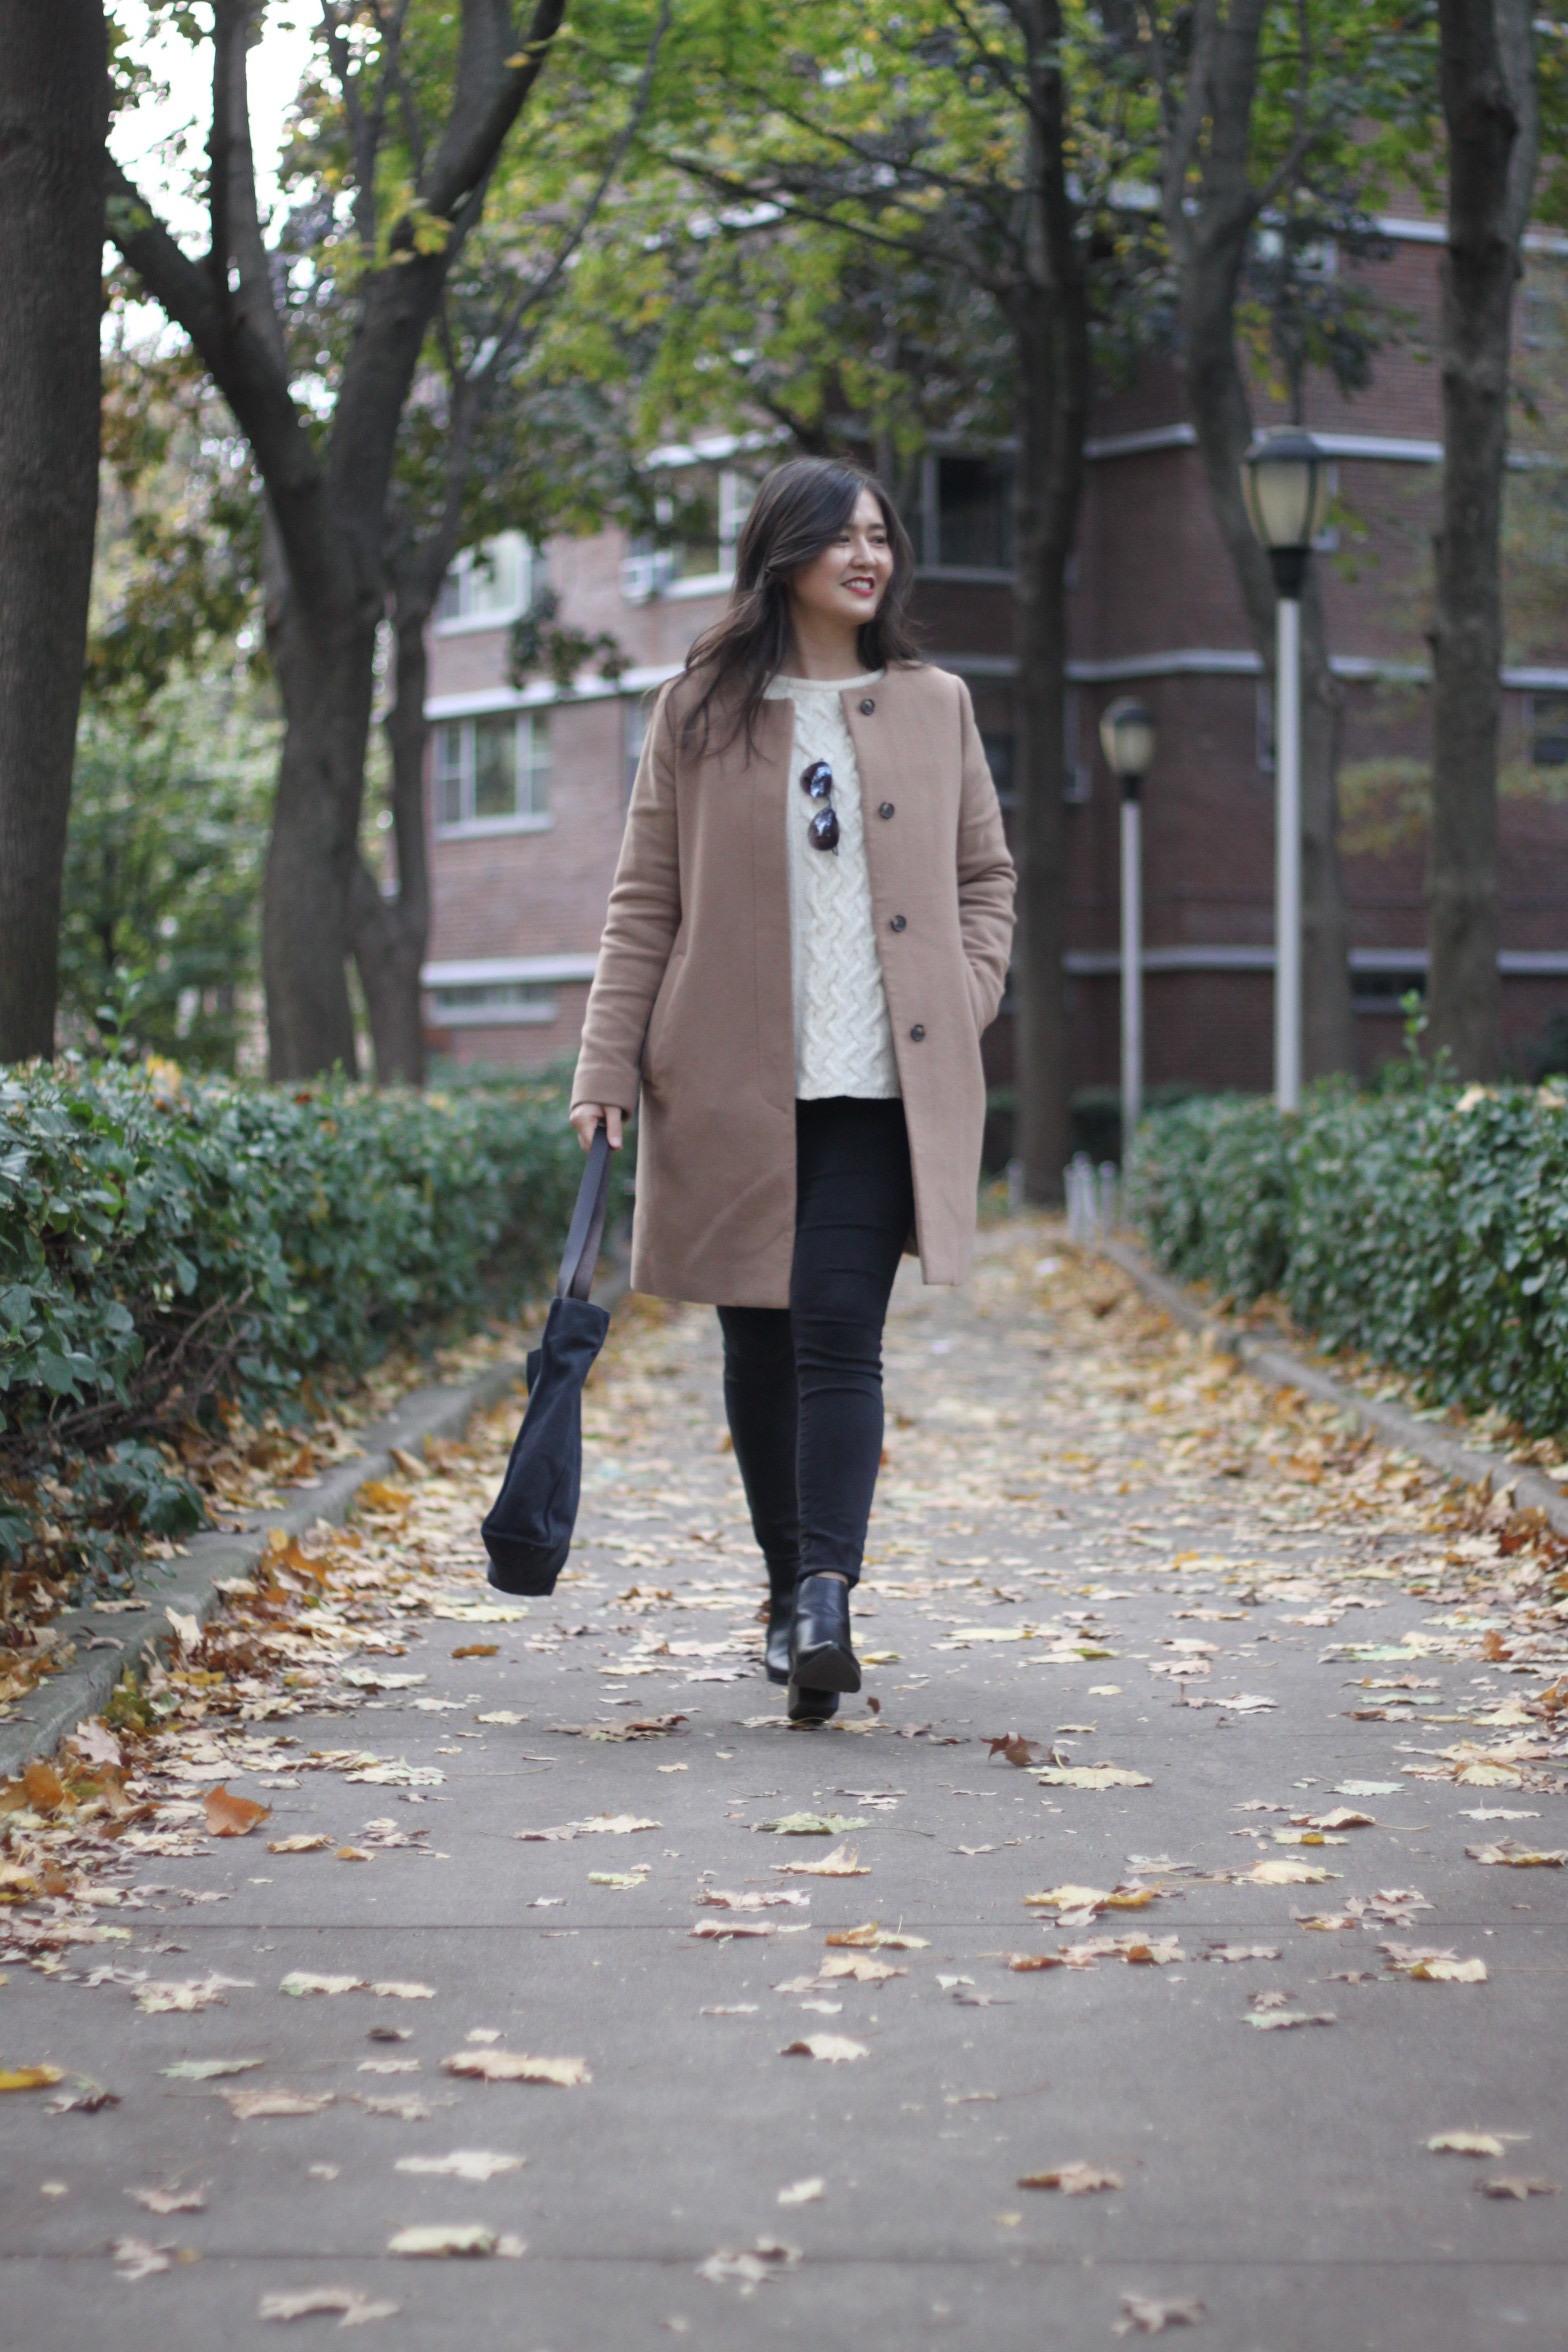 Coat:  Uniqlo . Sweater: Zara (similar  here ). Jeans: American Eagle. Boots:  ASOS .